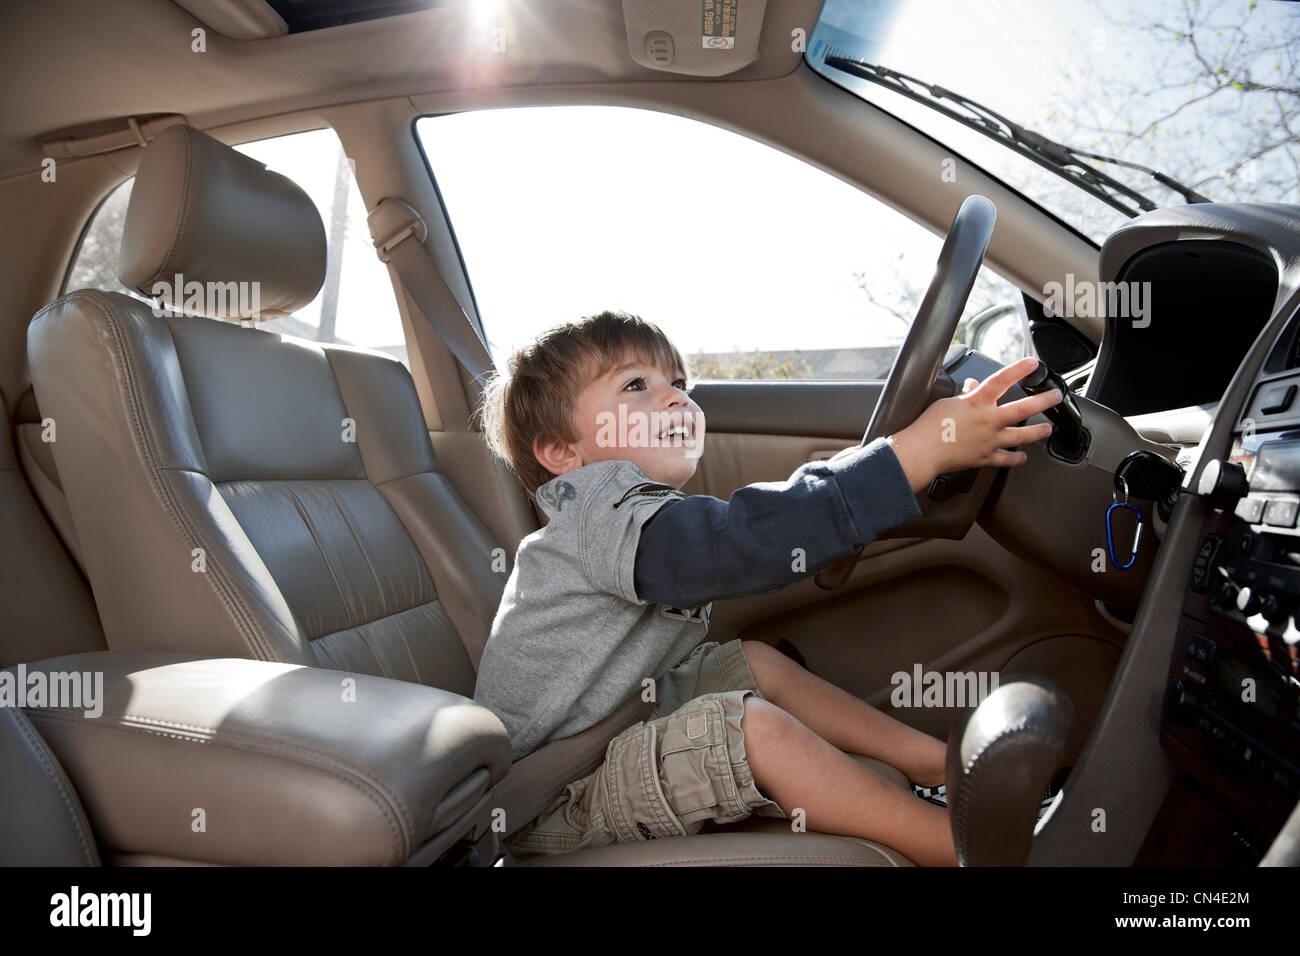 Little boy pretending to drive car - Stock Image